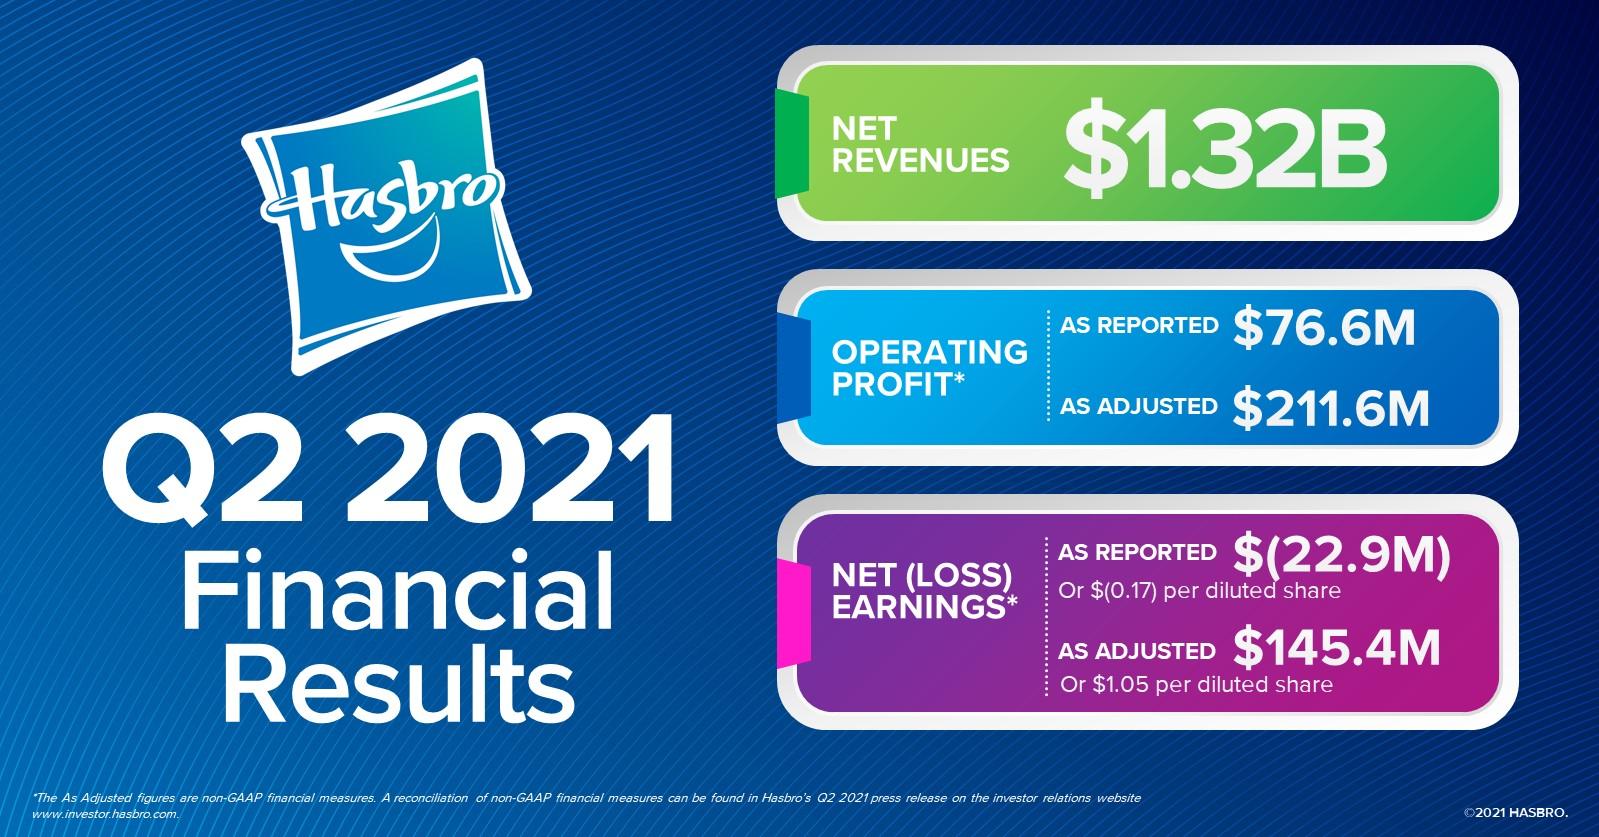 Hasbro Reports Second Quarter 2021 Financial Results